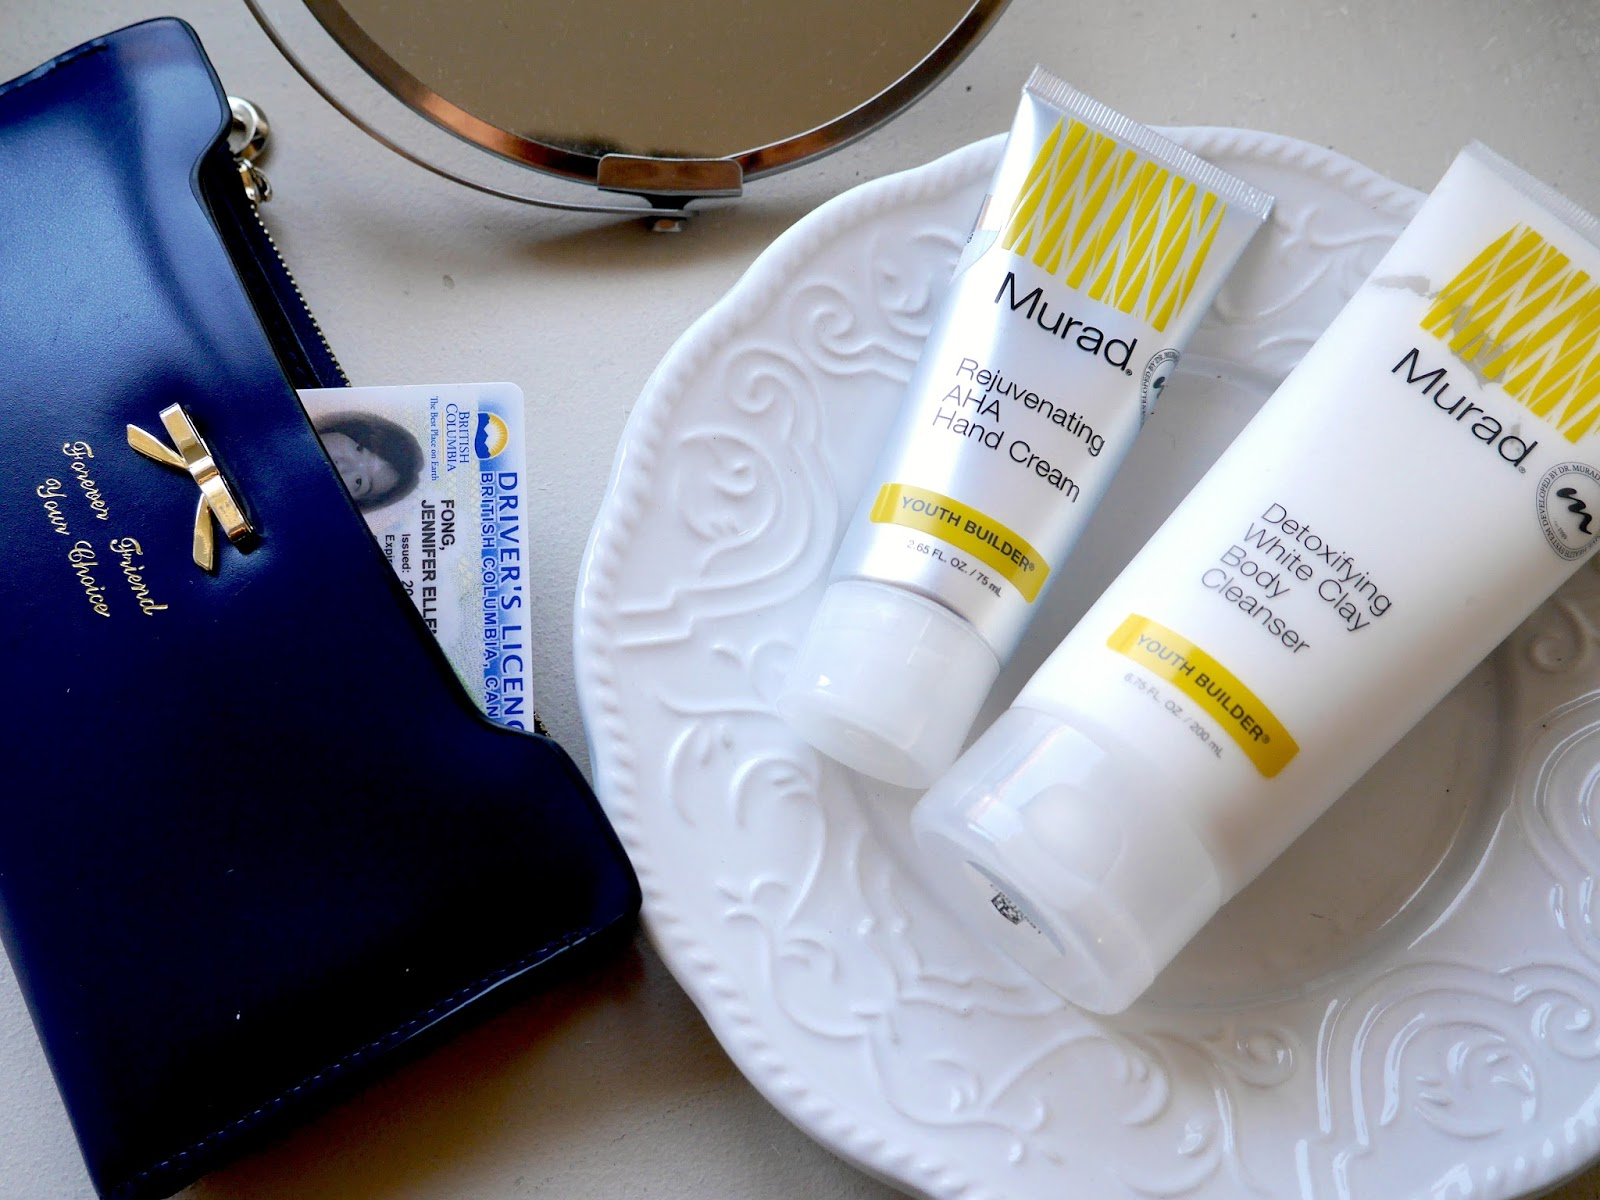 Murad Youth Builder rejuvenating aha hand cream detoxifying white clay body cleanser review